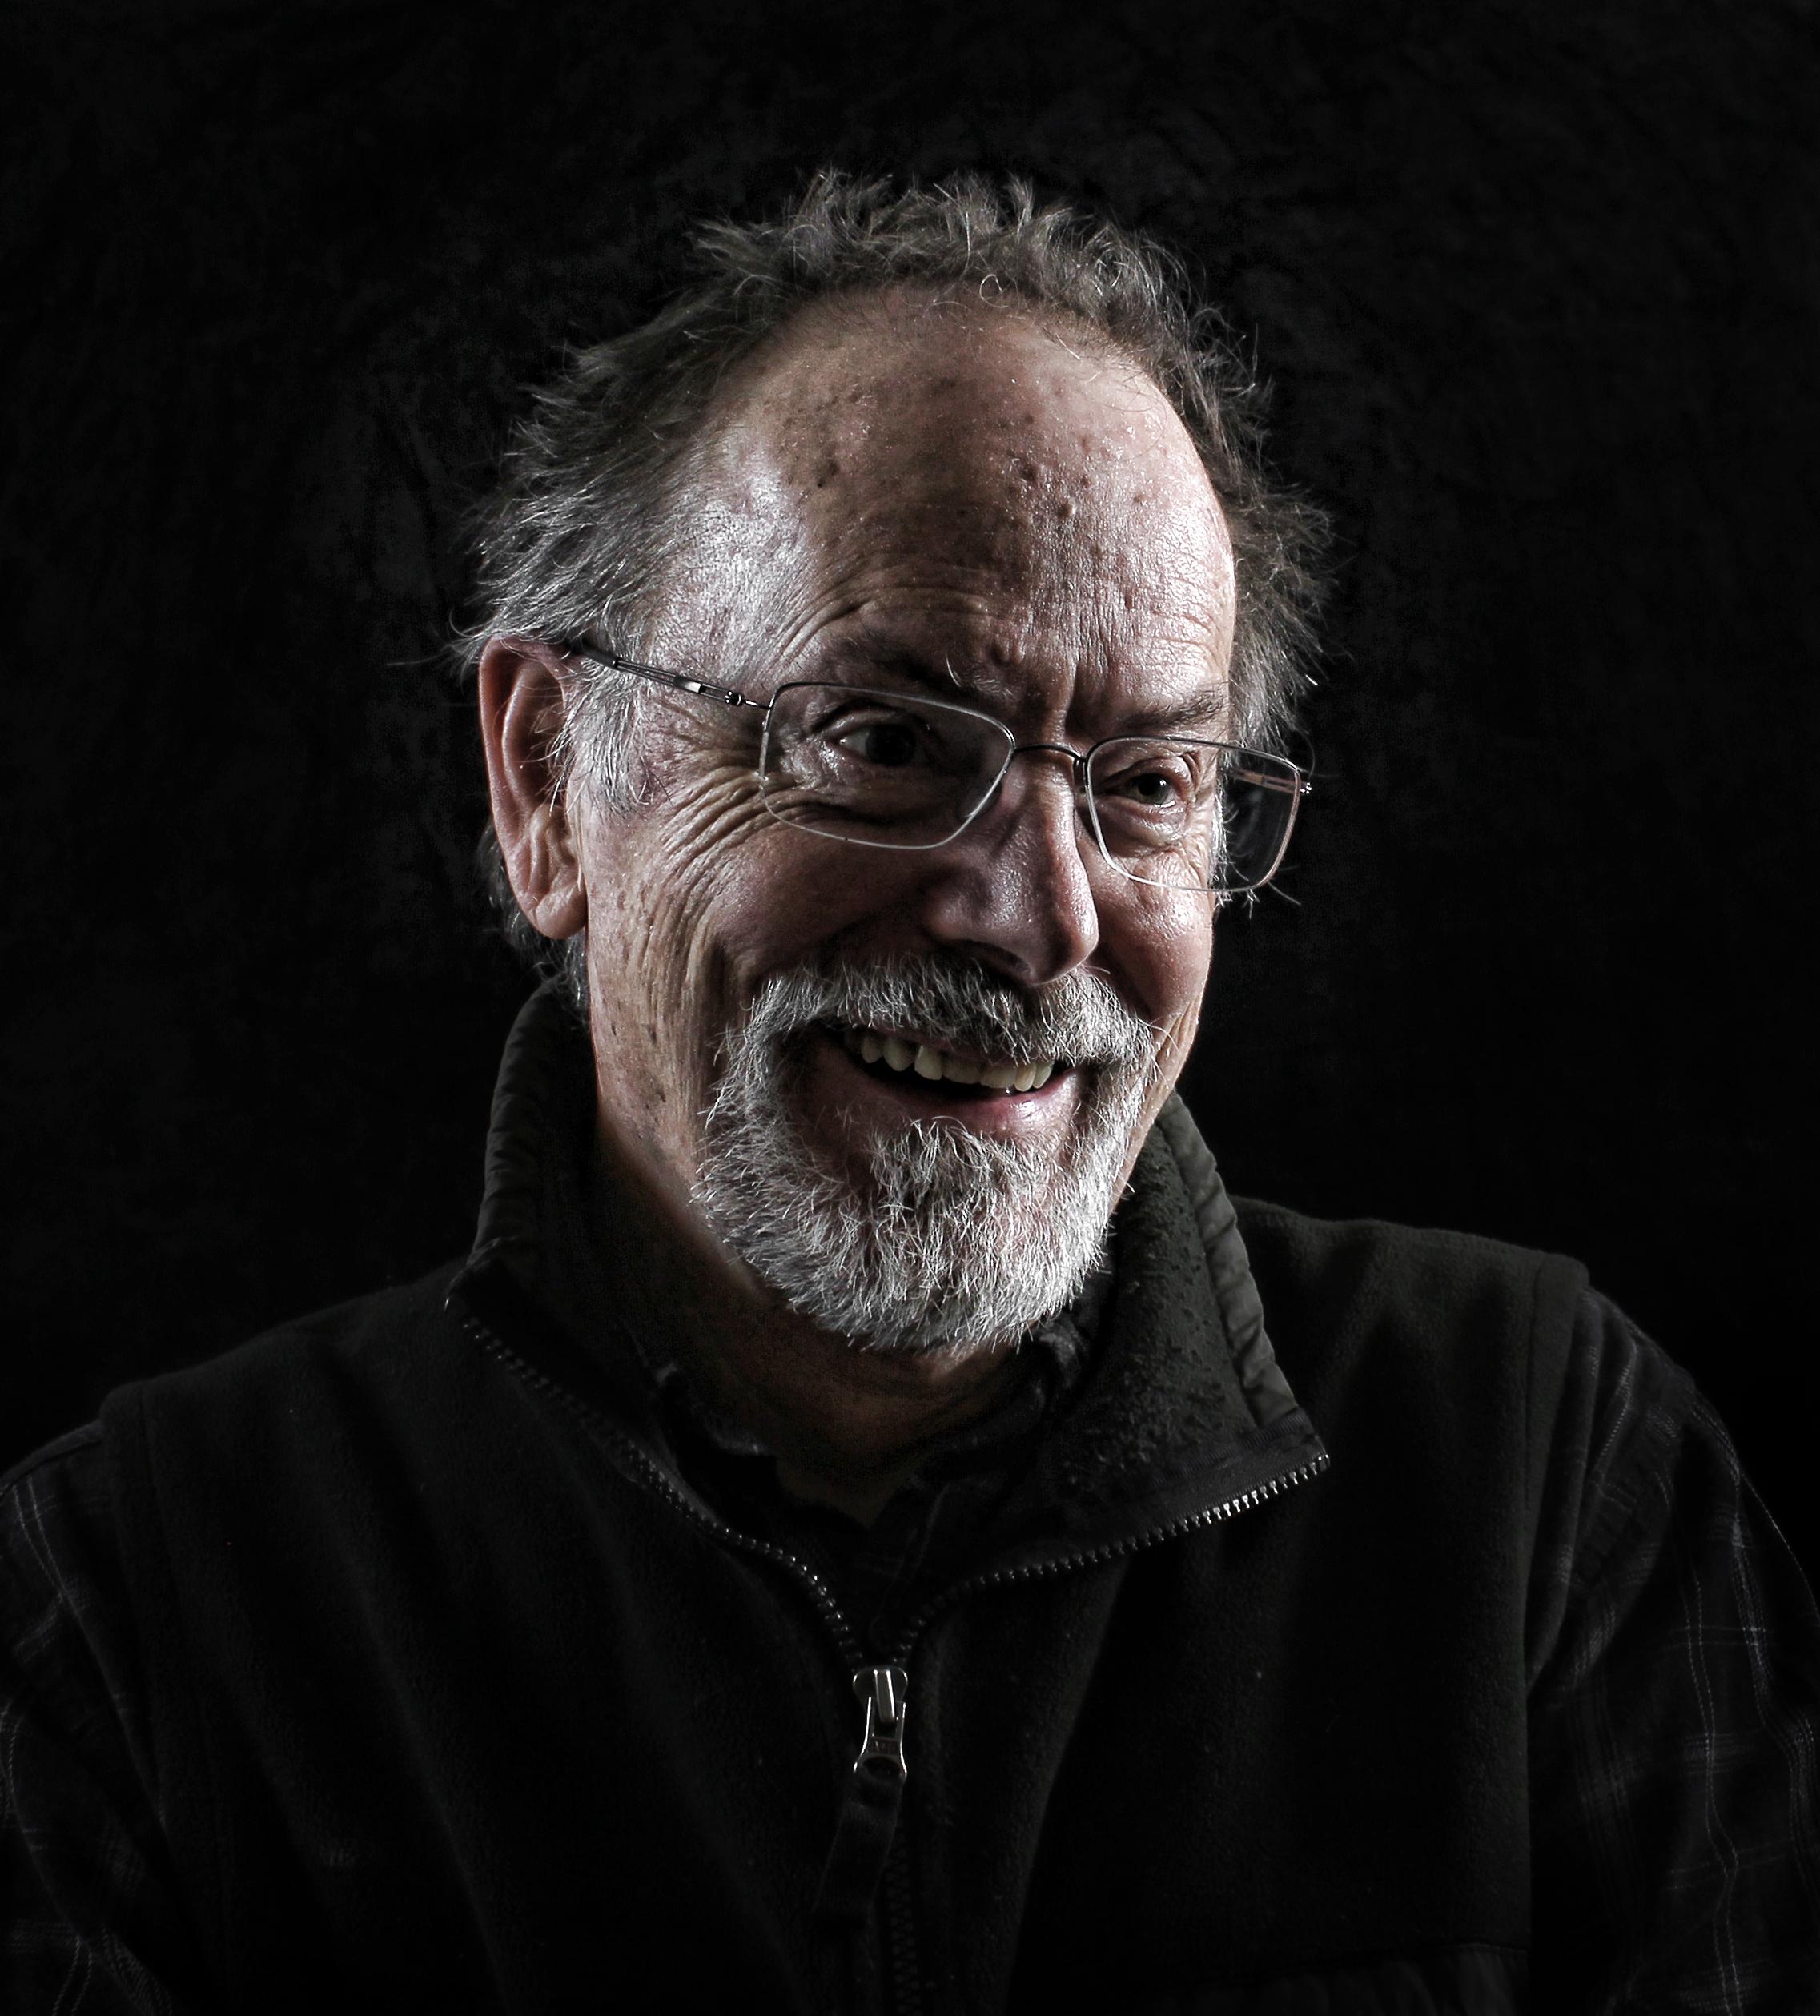 A self portrait of California leather artist Tom Banwell